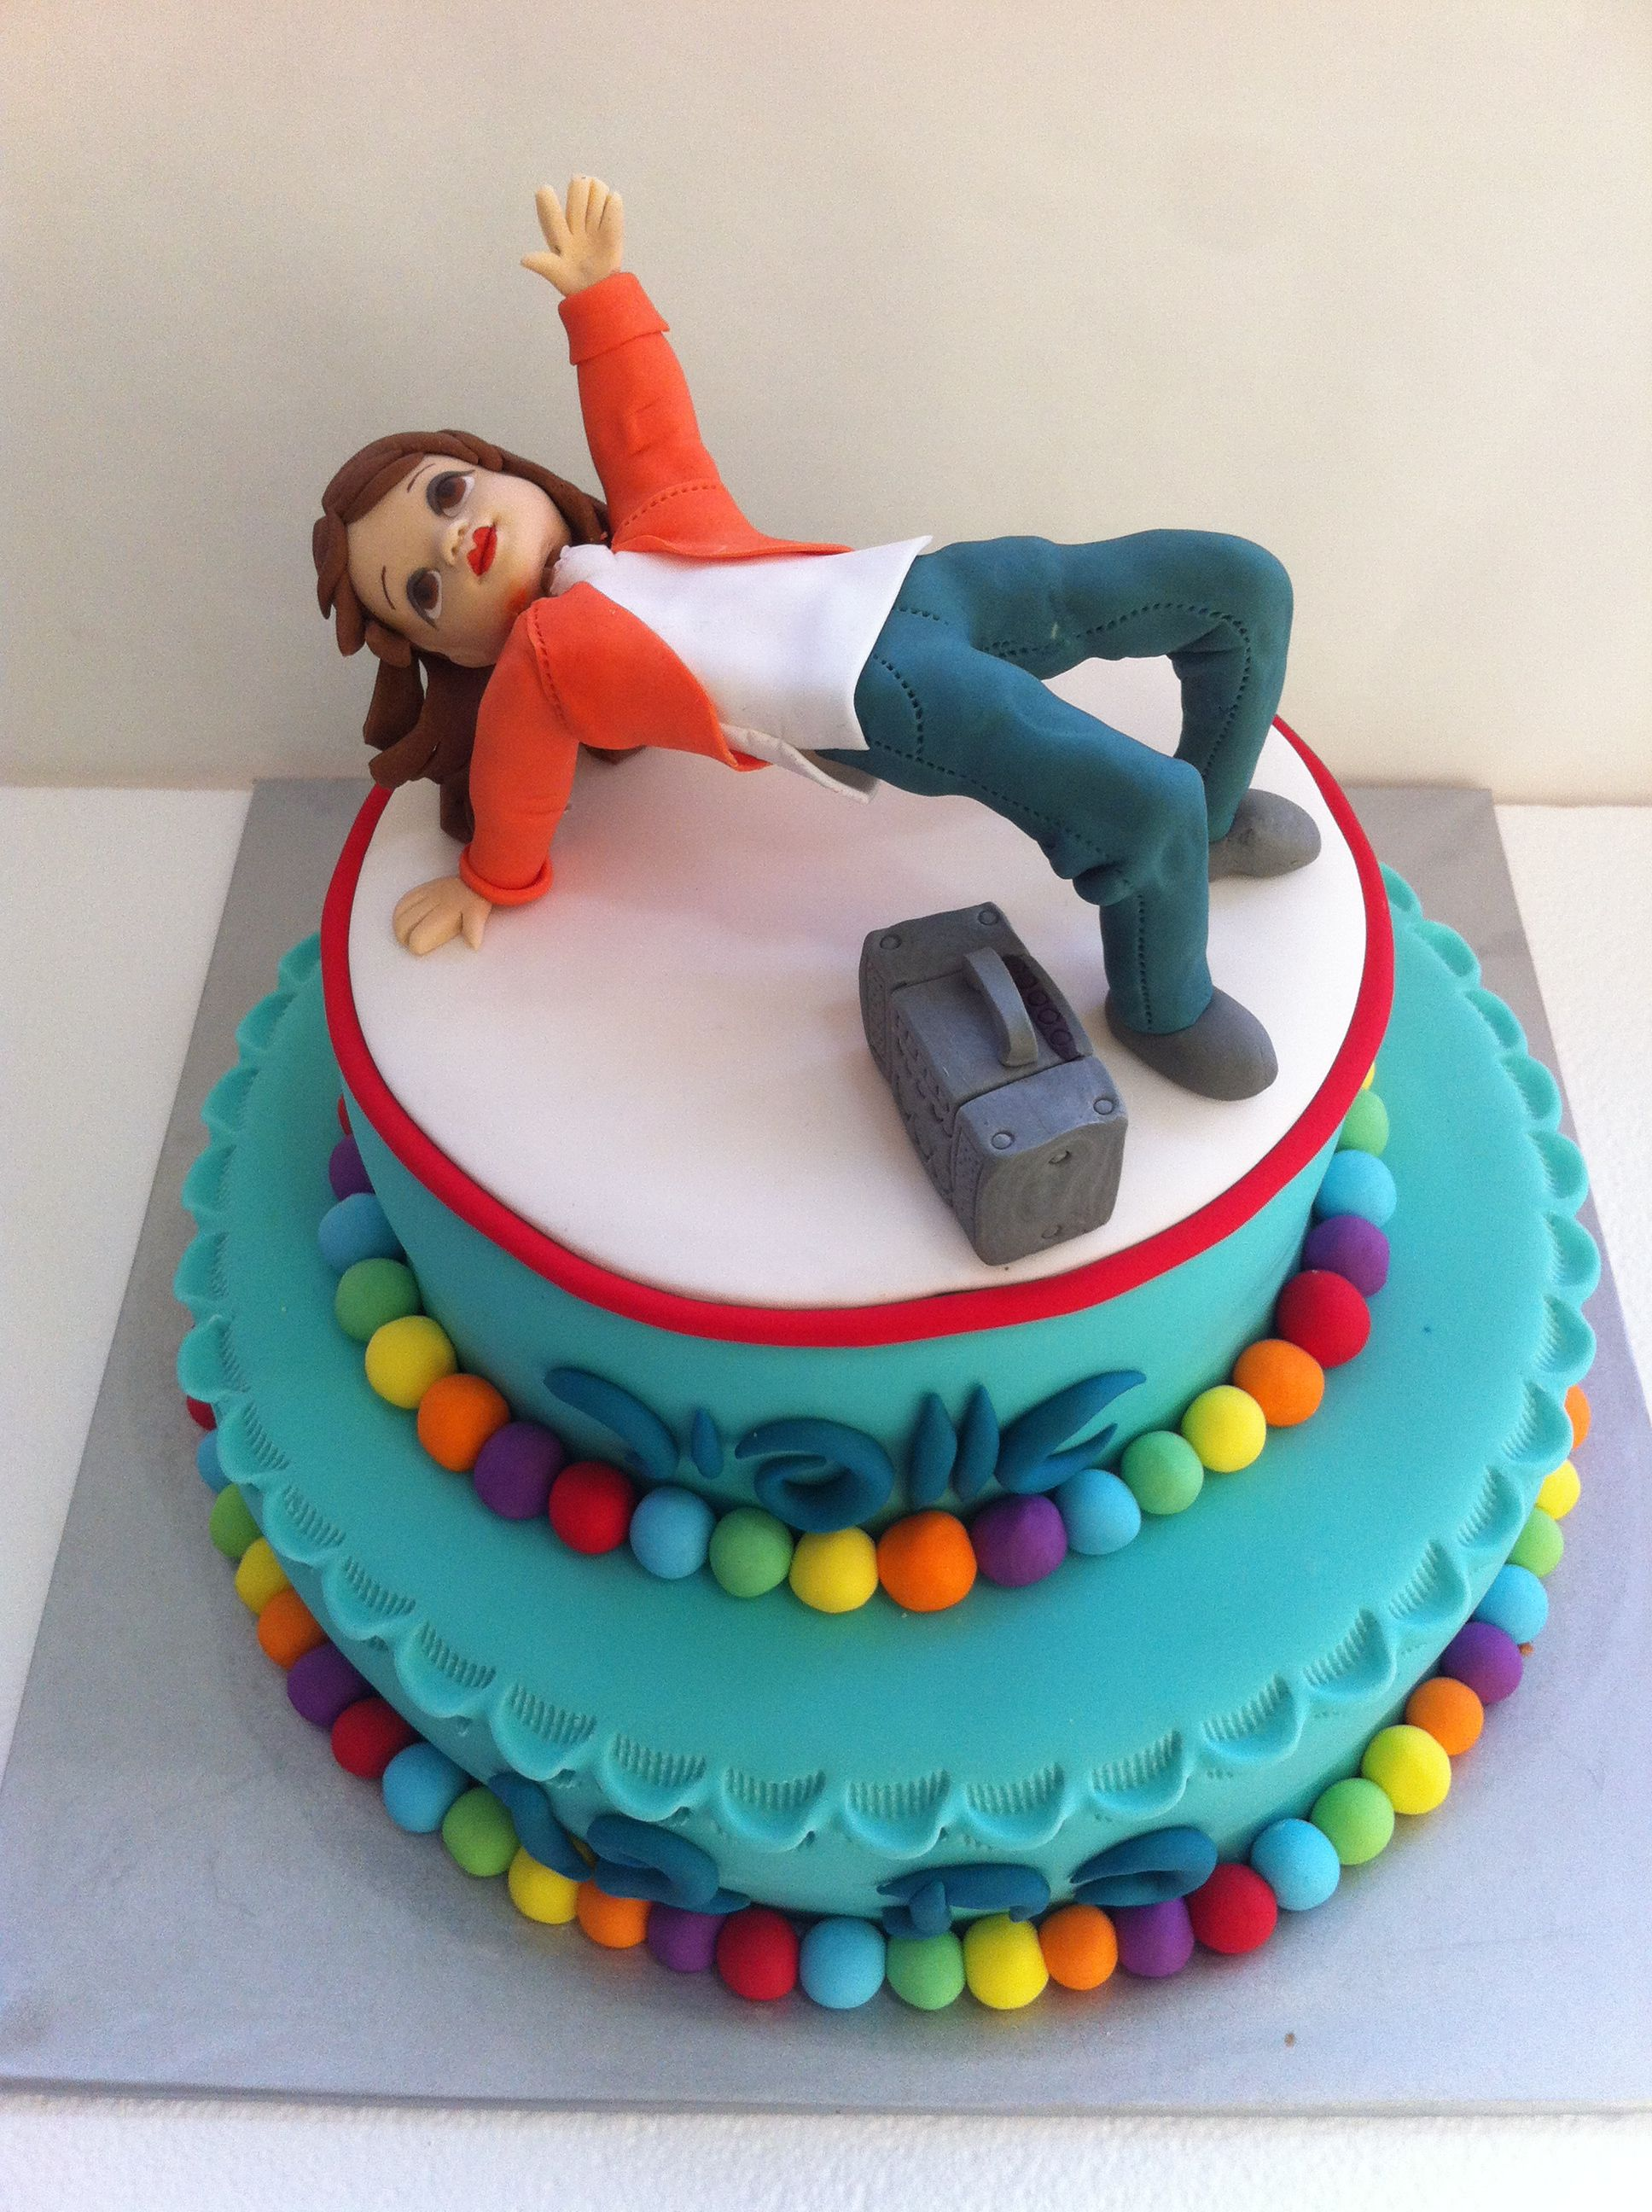 Hip Hop Dancer Cake My Cakes Pinterest Cake Dance Cakes And